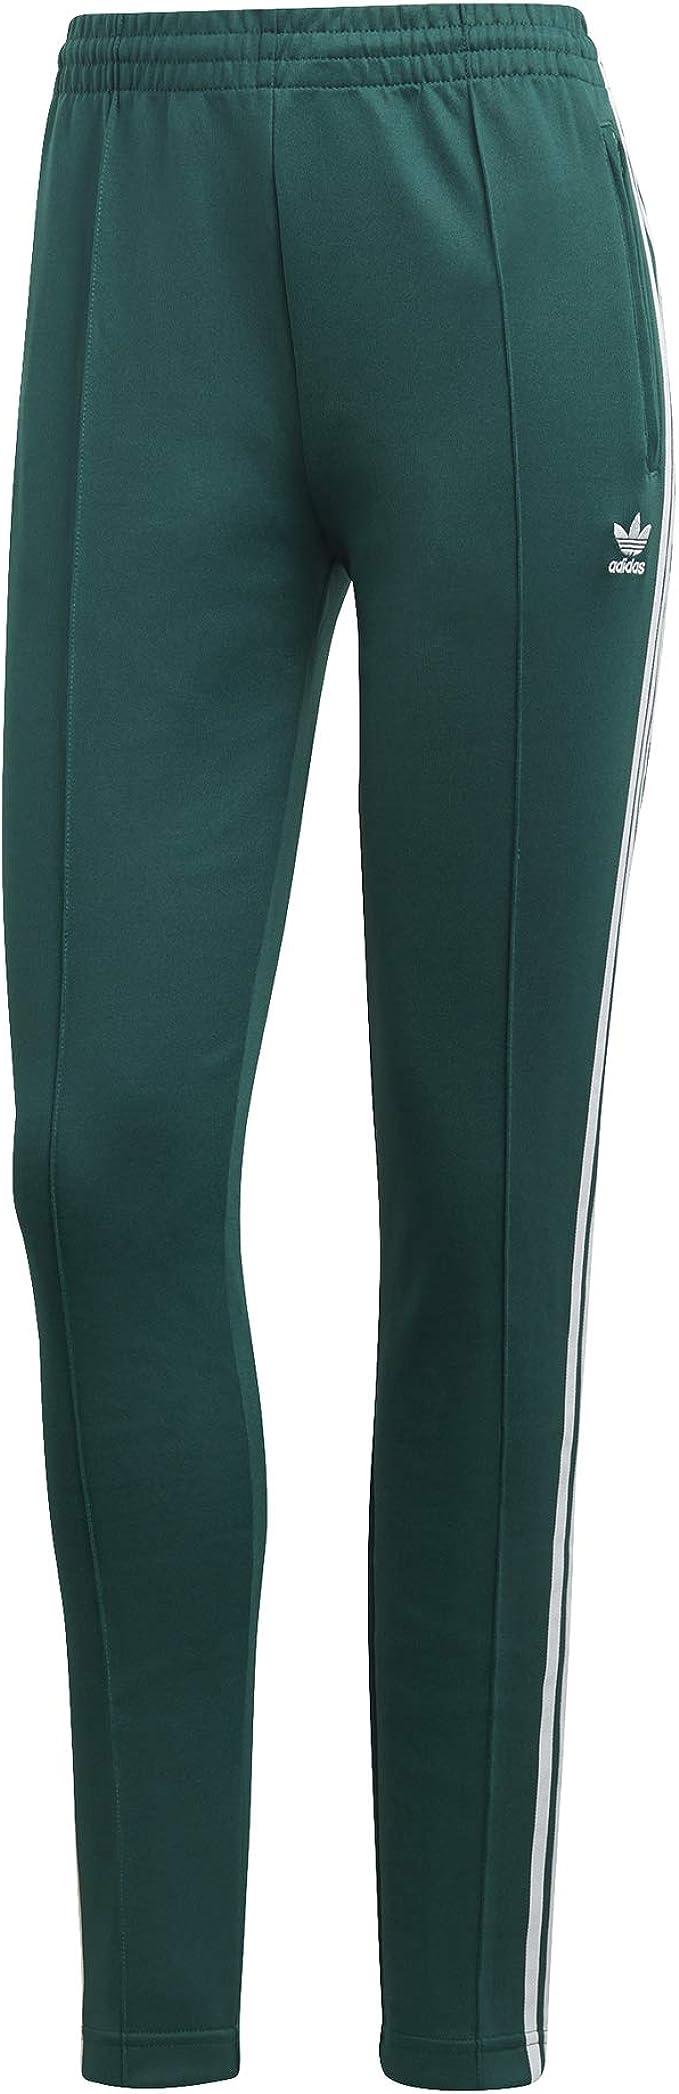 pantaloni felpa donna adidas